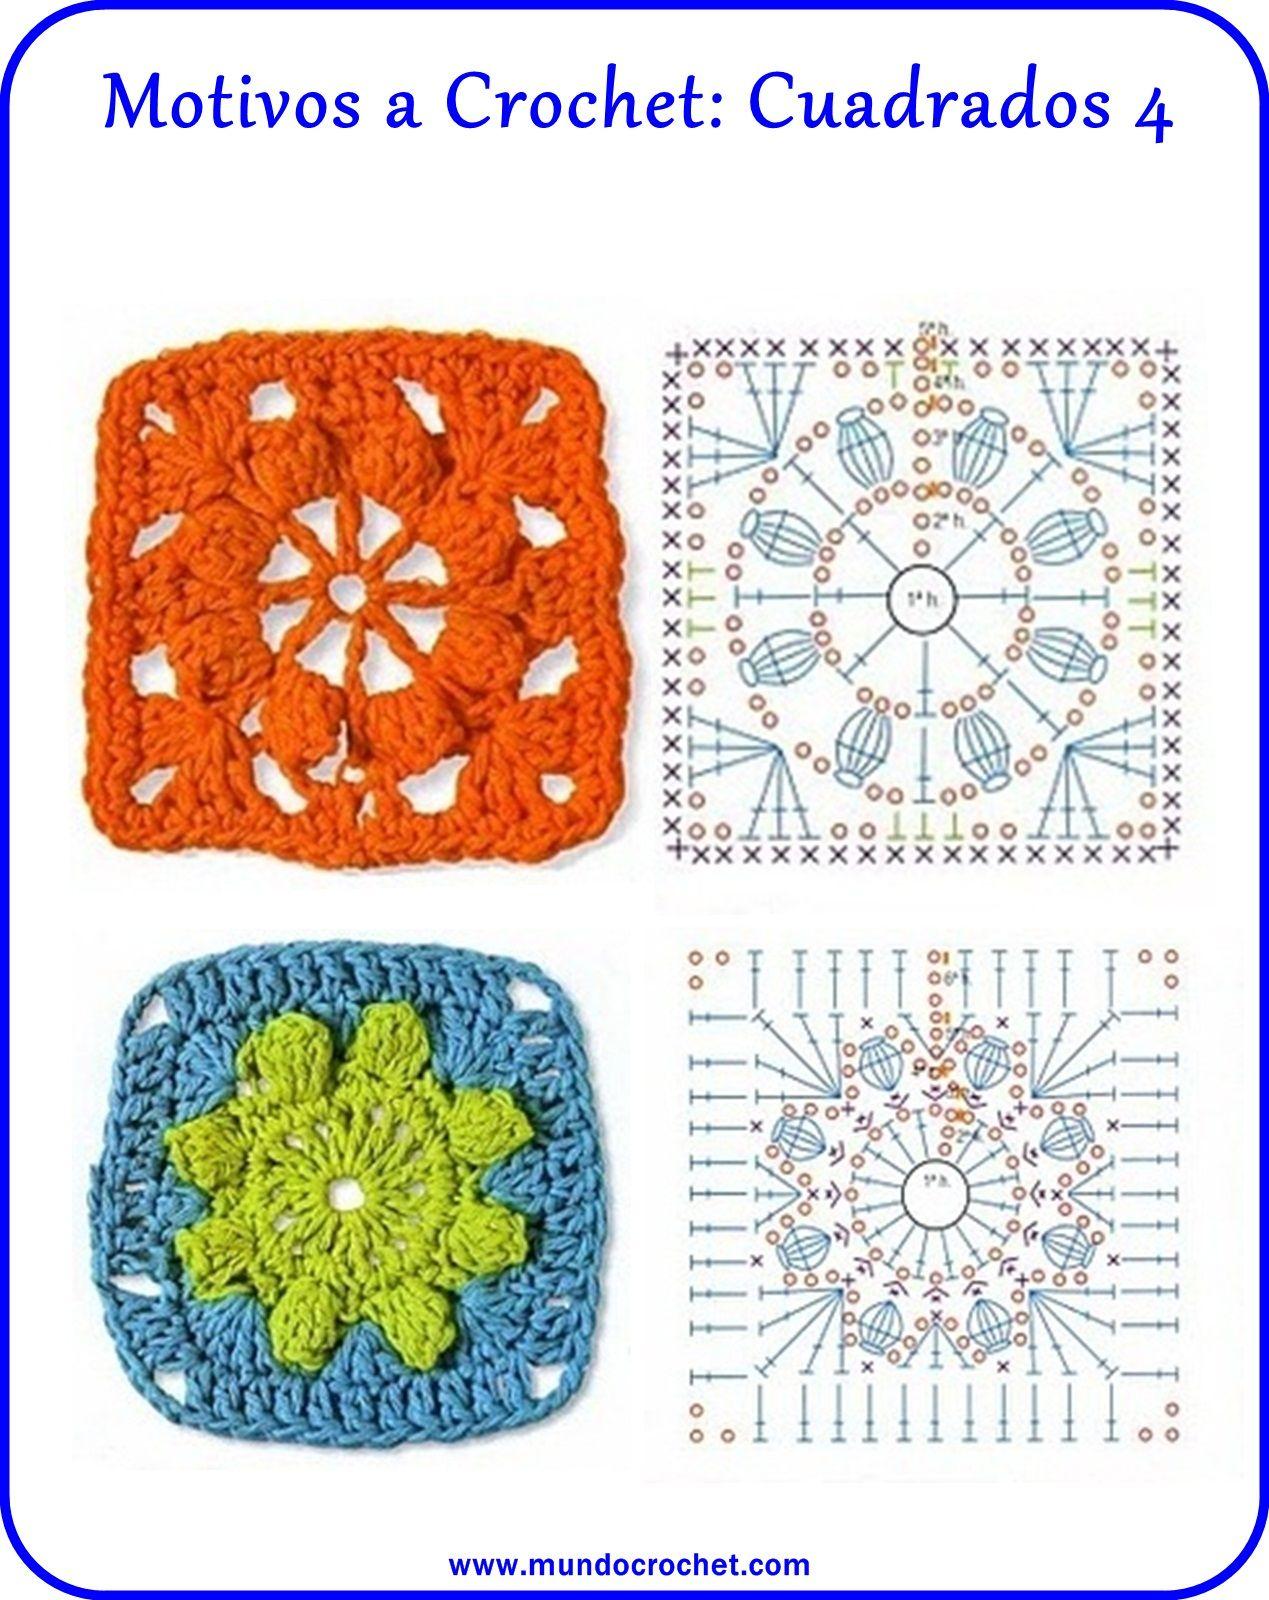 motivos cuadrados crochet | вязание плетение | Pinterest | Cuadrados ...